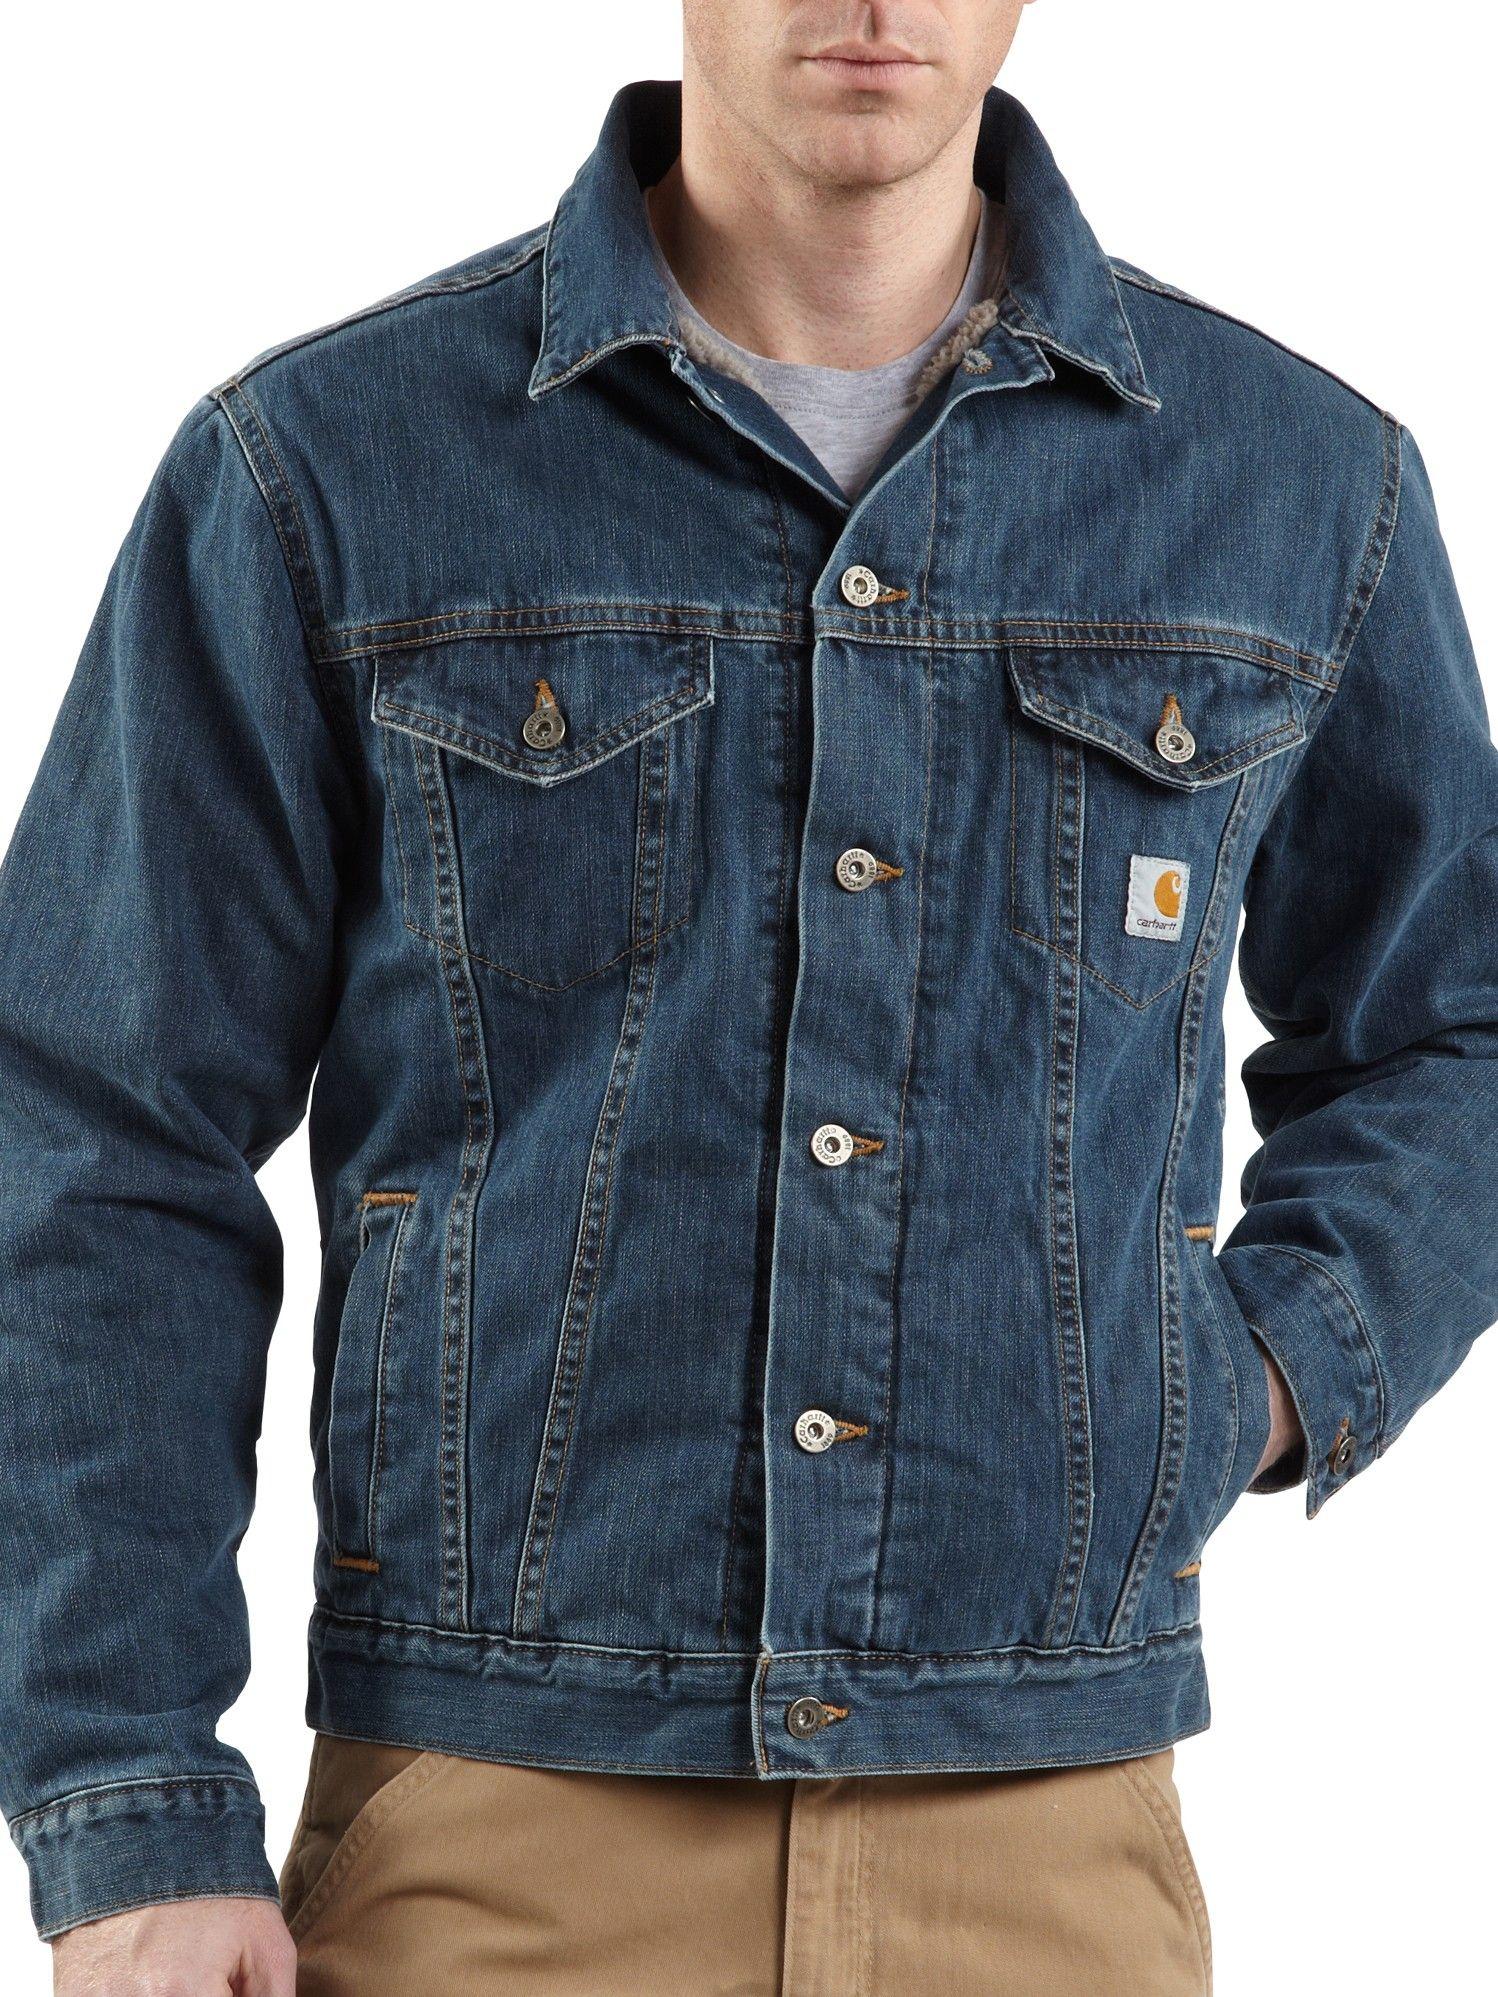 Pin On Men S Outerwear Coats Jackets [ 1997 x 1498 Pixel ]